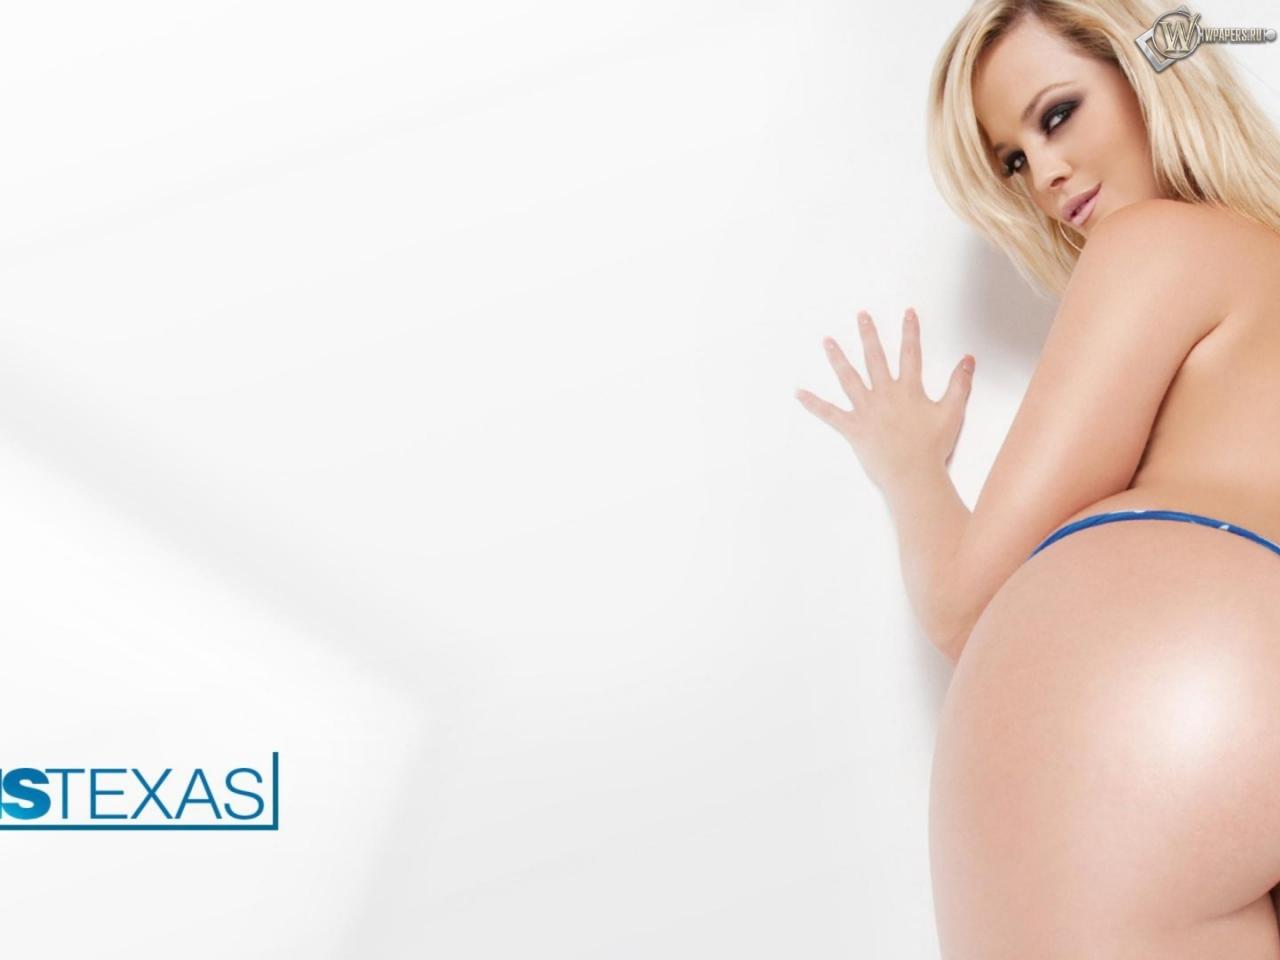 Alexis Texas 1280x960